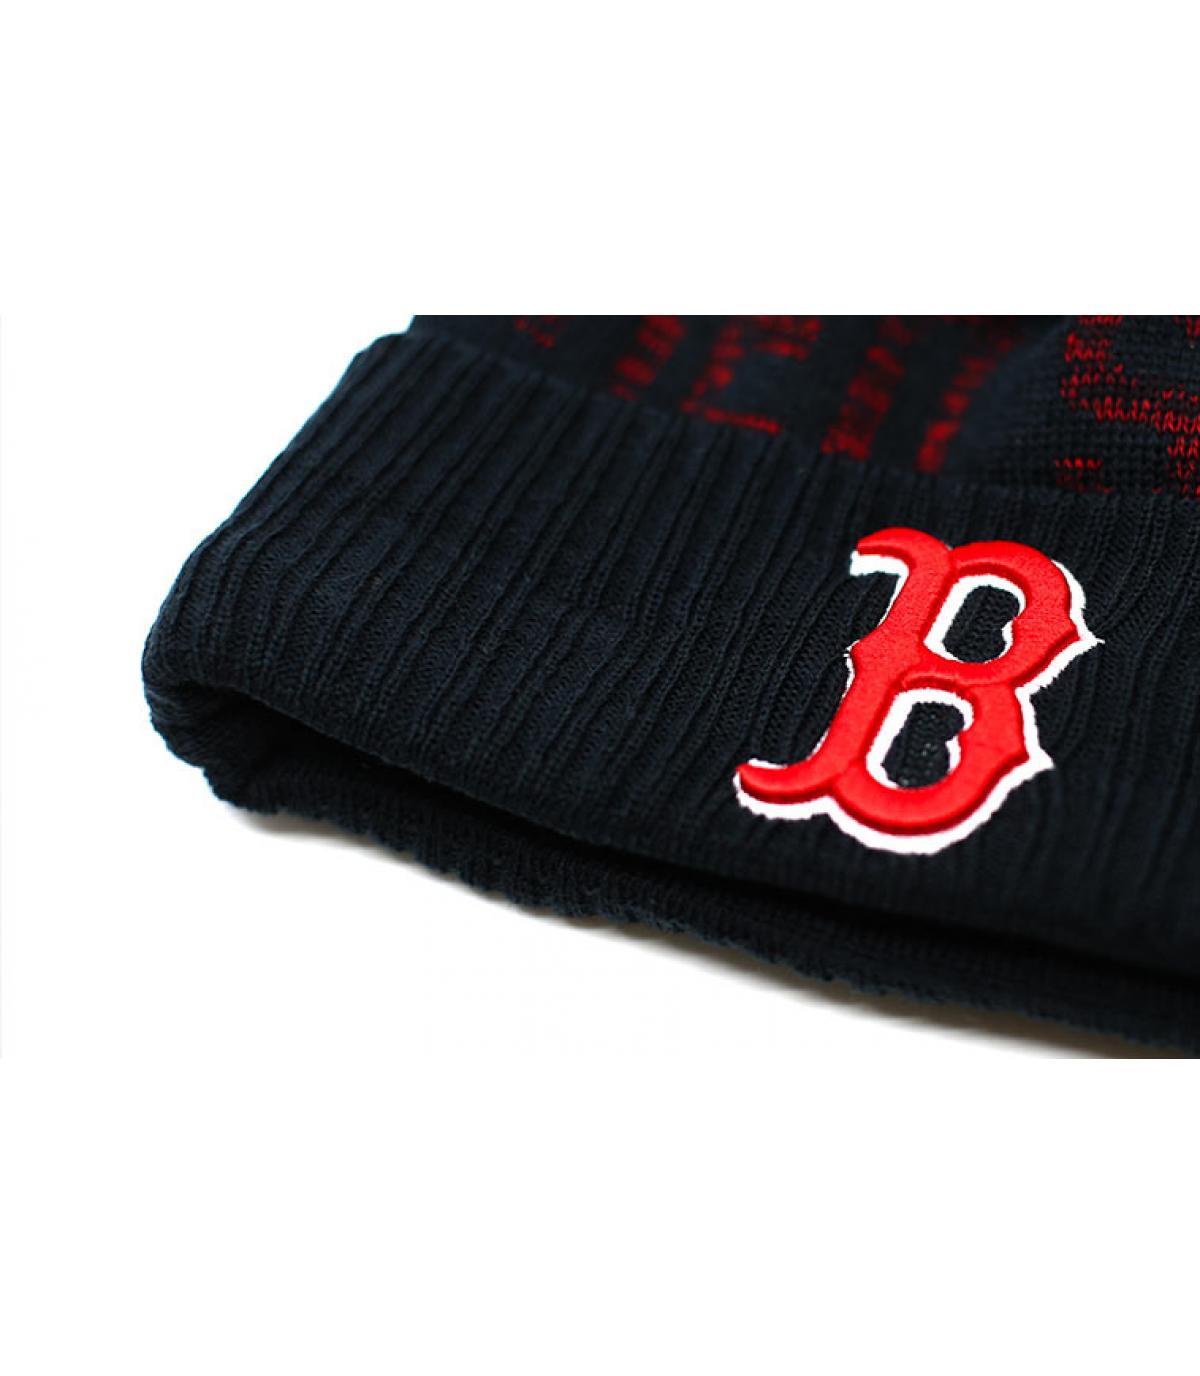 Details Mütze MLB Sport Knit Boston - Abbildung 3